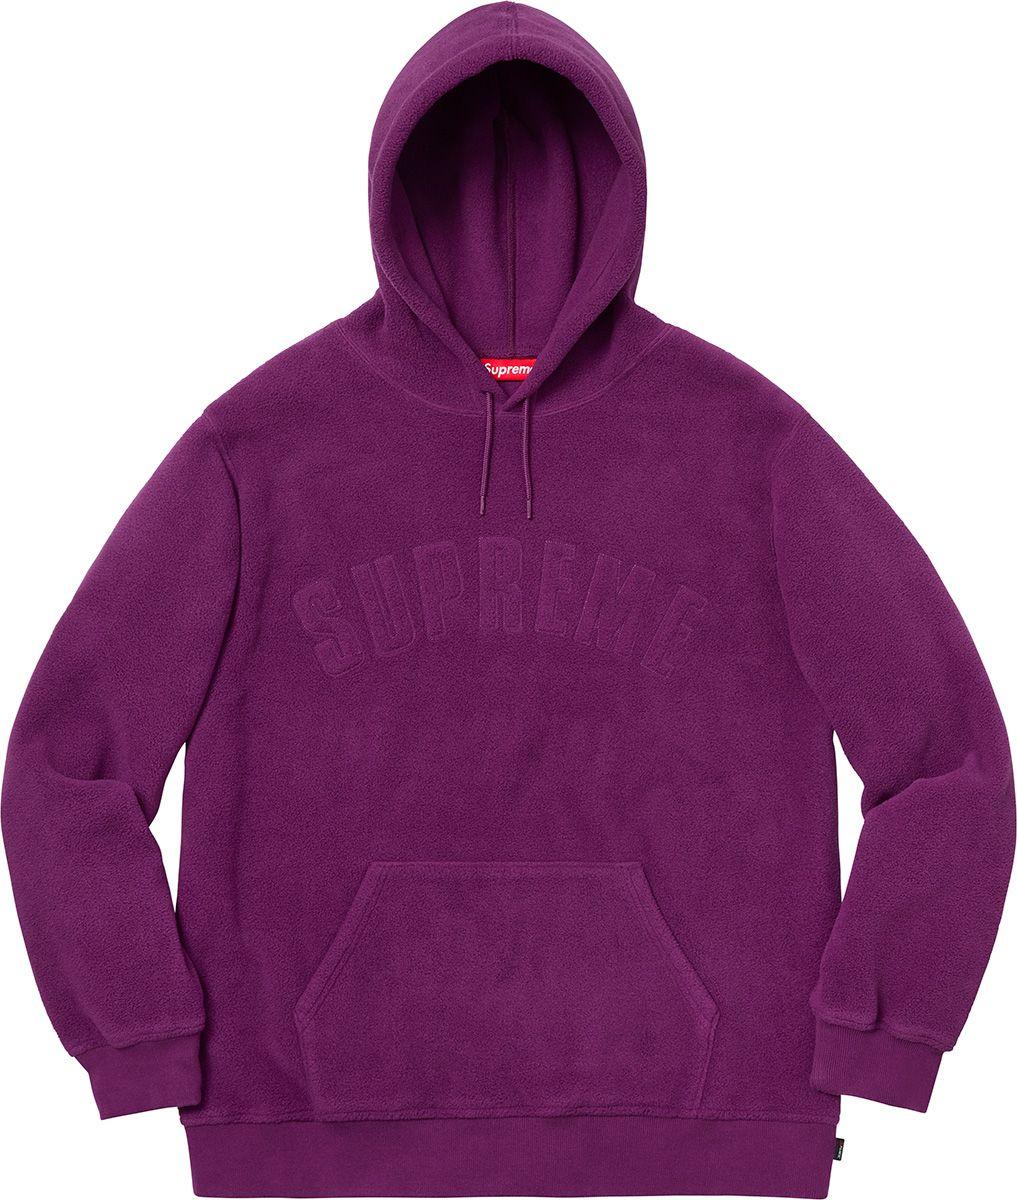 Supreme Jesus And Mary Hooded Sweatshirt Hooded Sweatshirts Sweatshirts Fashion [ 1200 x 1017 Pixel ]